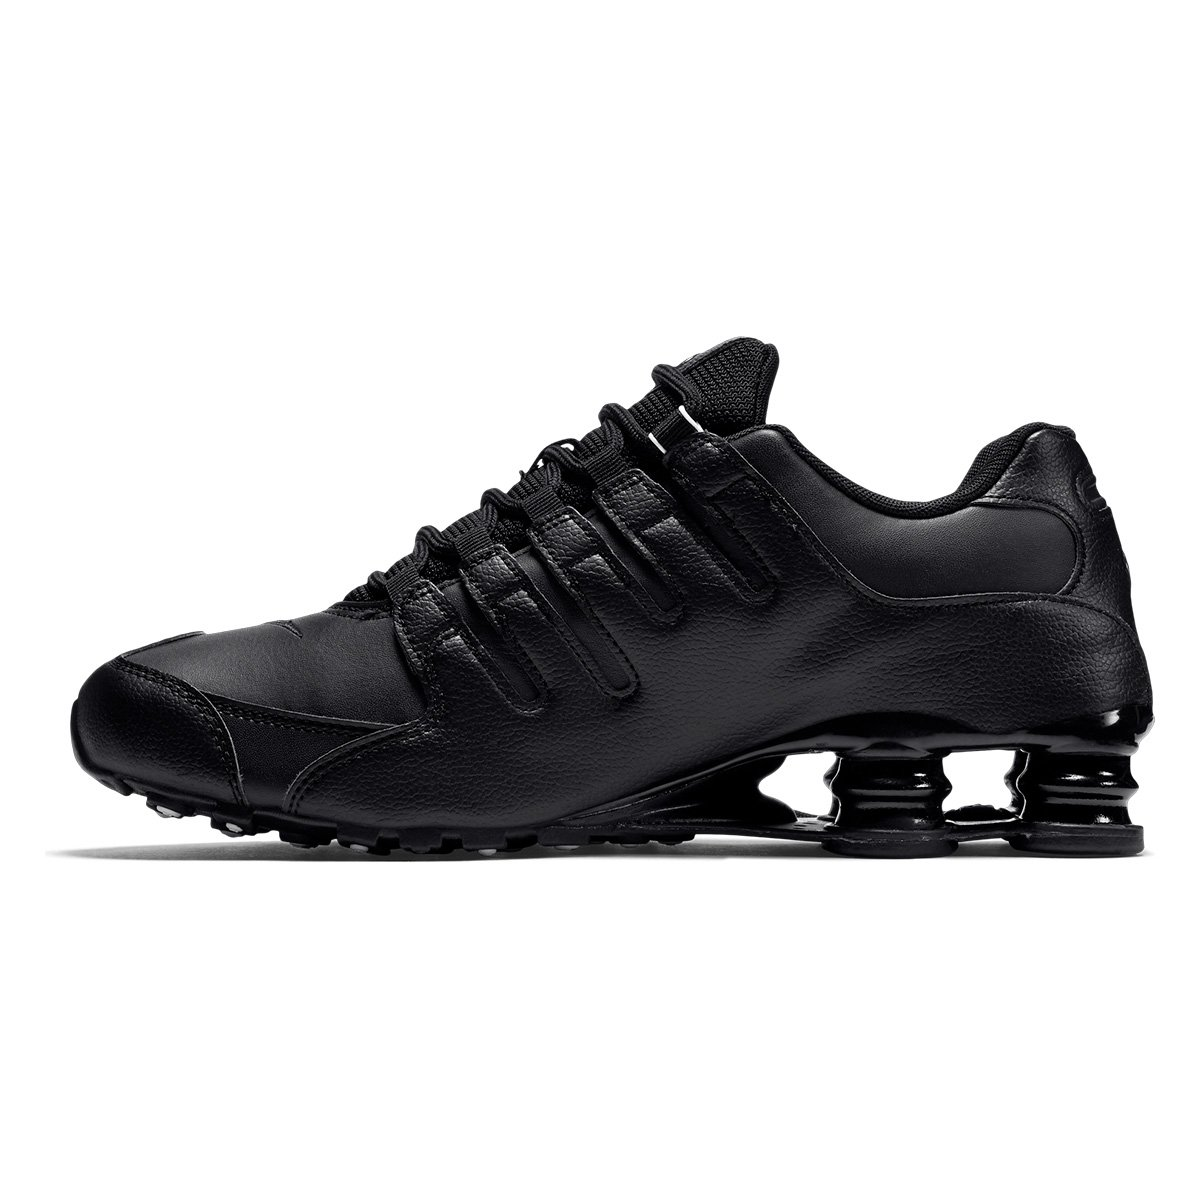 Tênis Nike Shox Nz Eu Masculino - Tam: 38 - 1